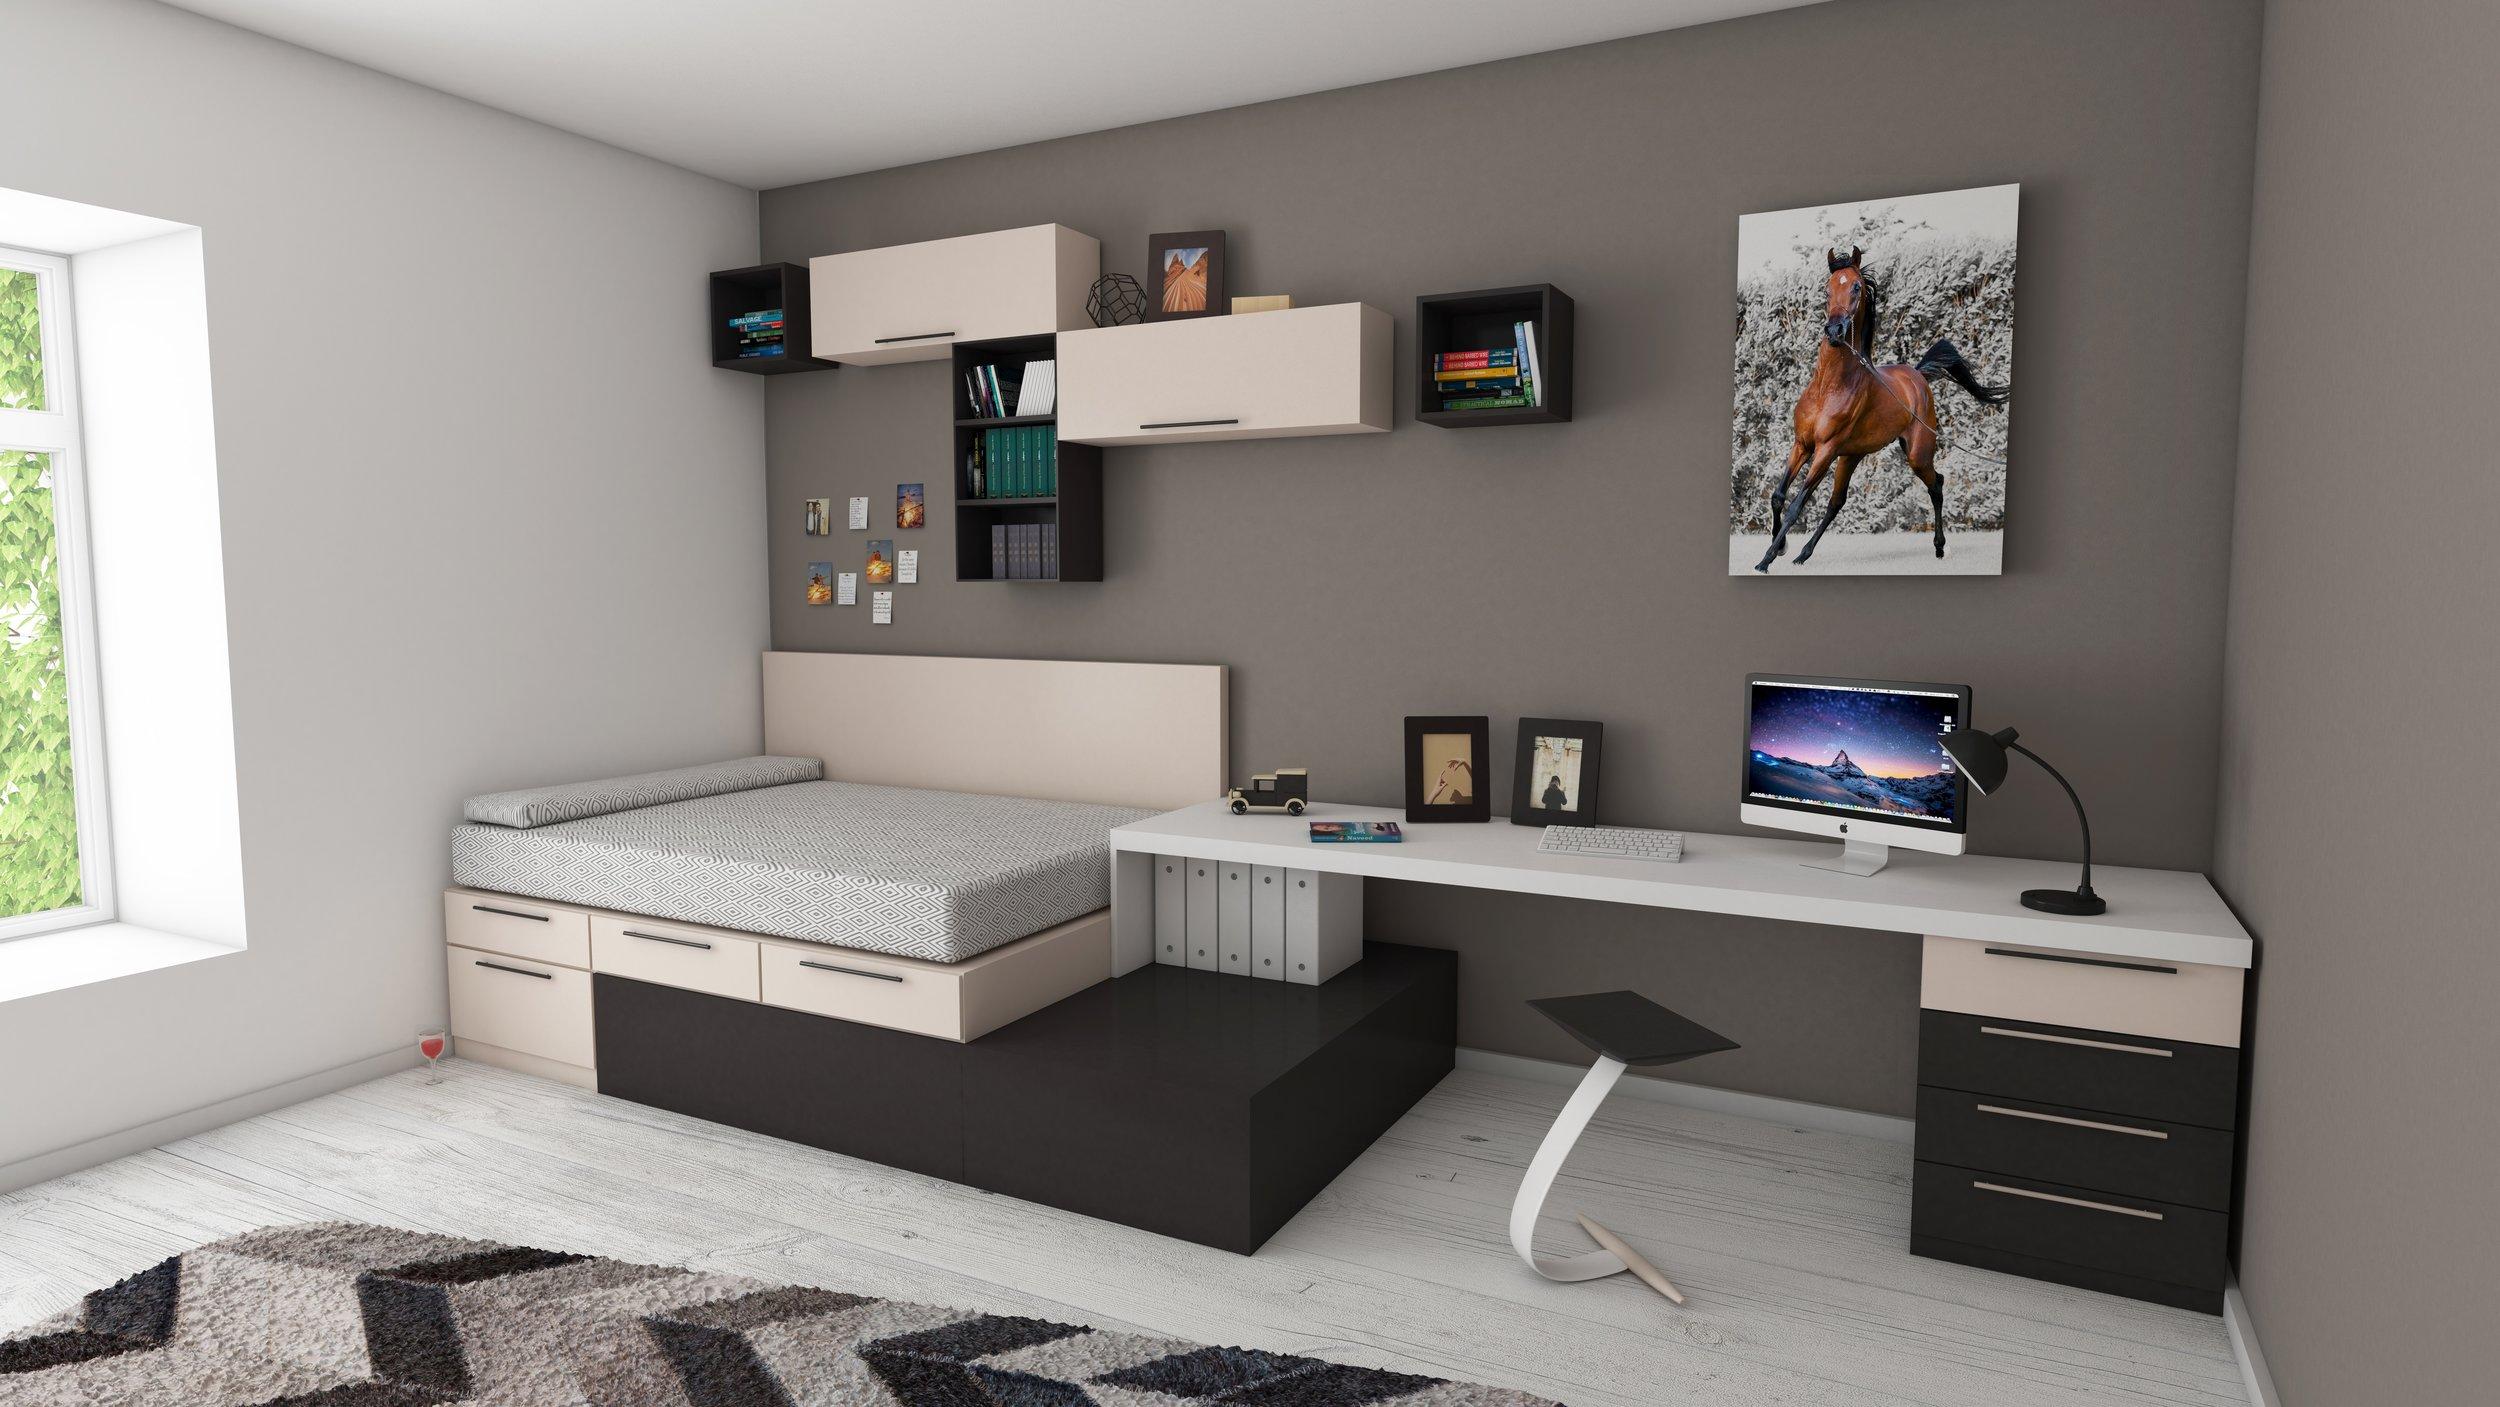 apartment-bed-bedroom-439227.jpg